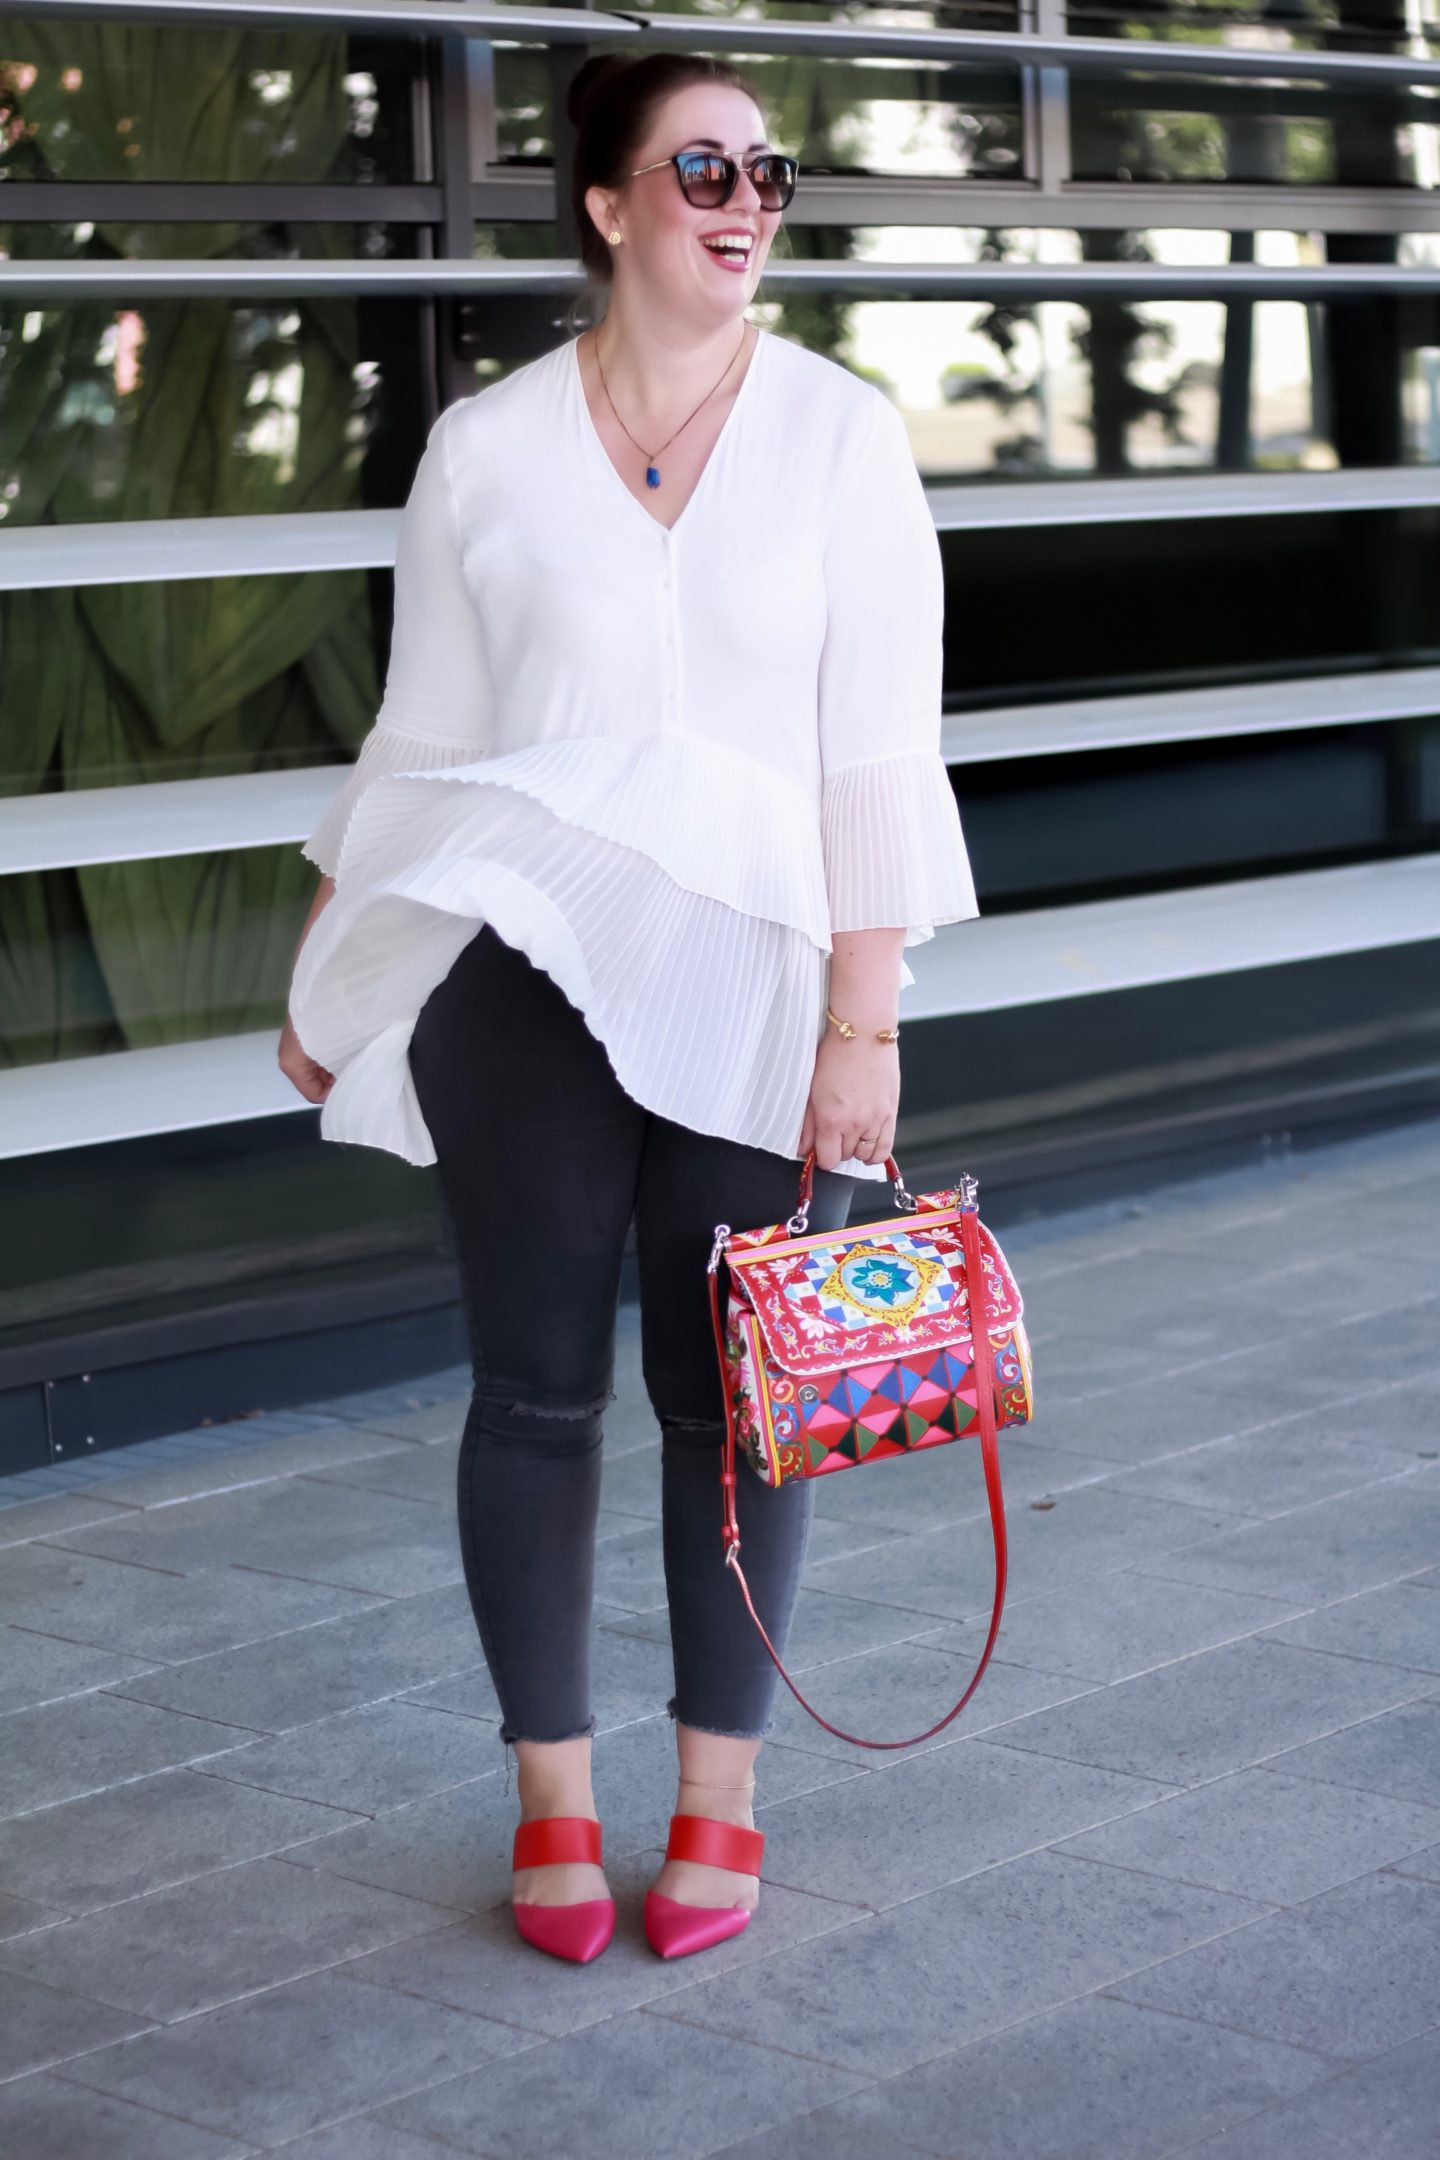 Dolce-Gabbana-Sicily-Mambo-Bag-Carretto-Plisseebluse-Zara-Shoes-of-Prey-Miss-Suzie-Loves-Susanne-Heidebach-Fashionblog